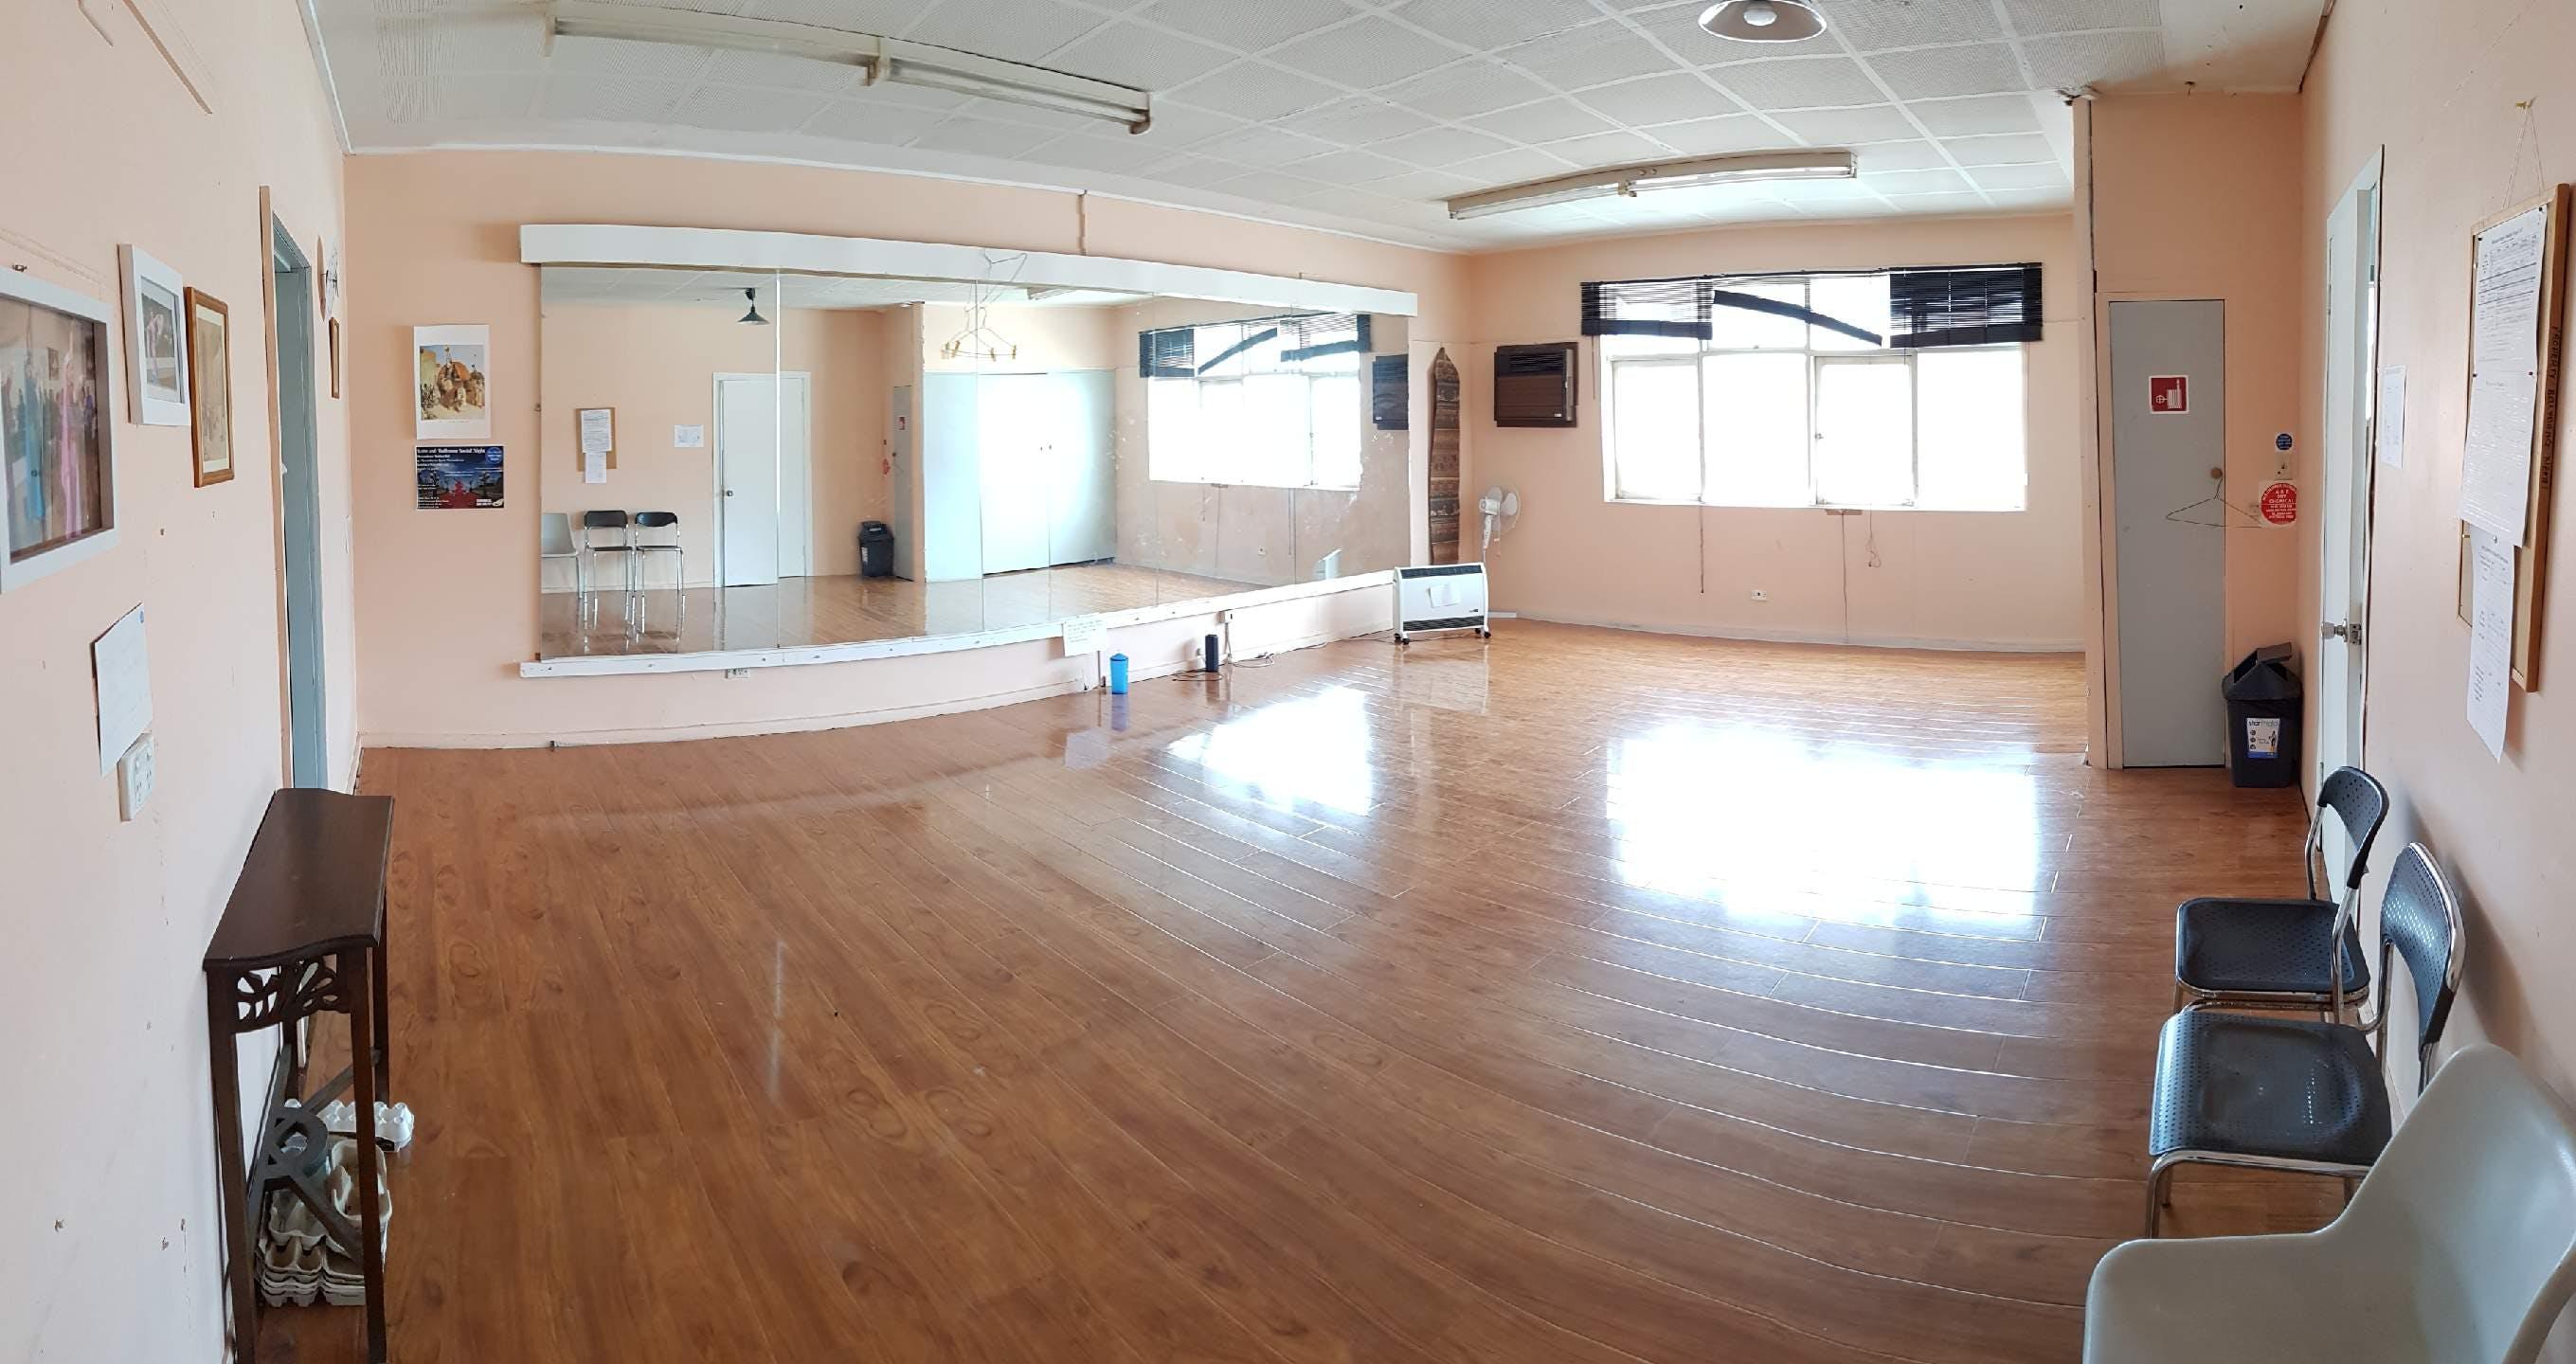 Studio 4, creative studio at Dance Be In It Centre, image 1